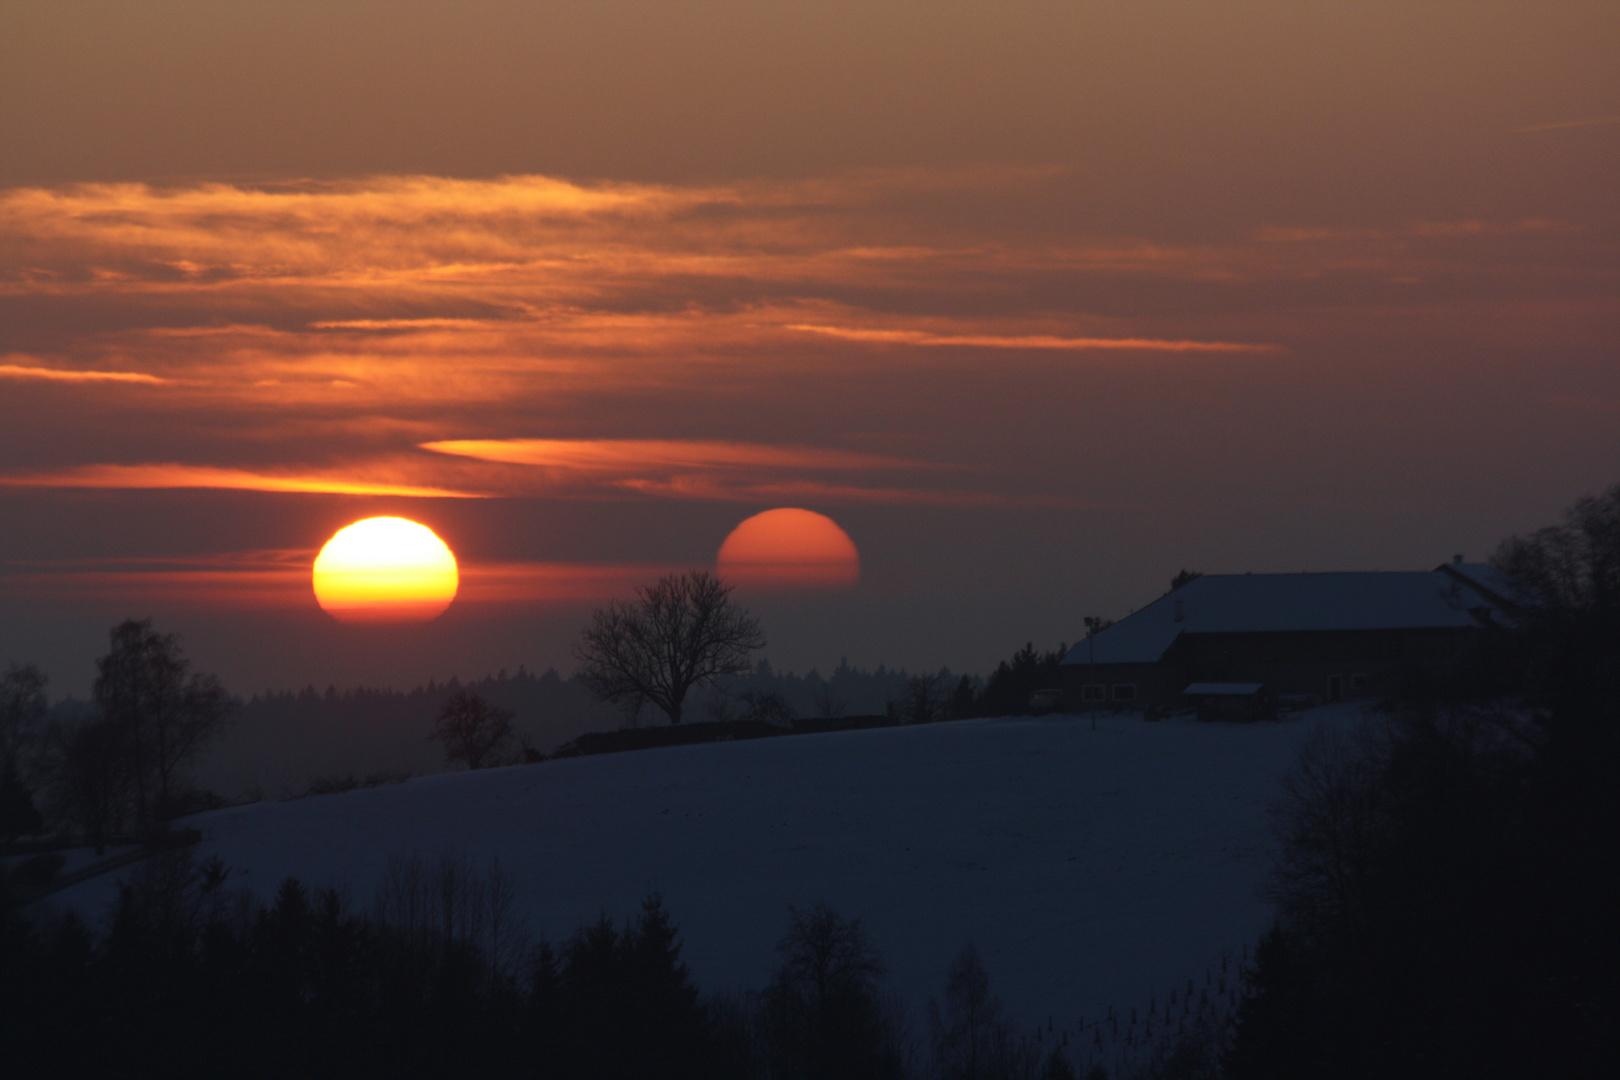 Sonnenuntergang x2